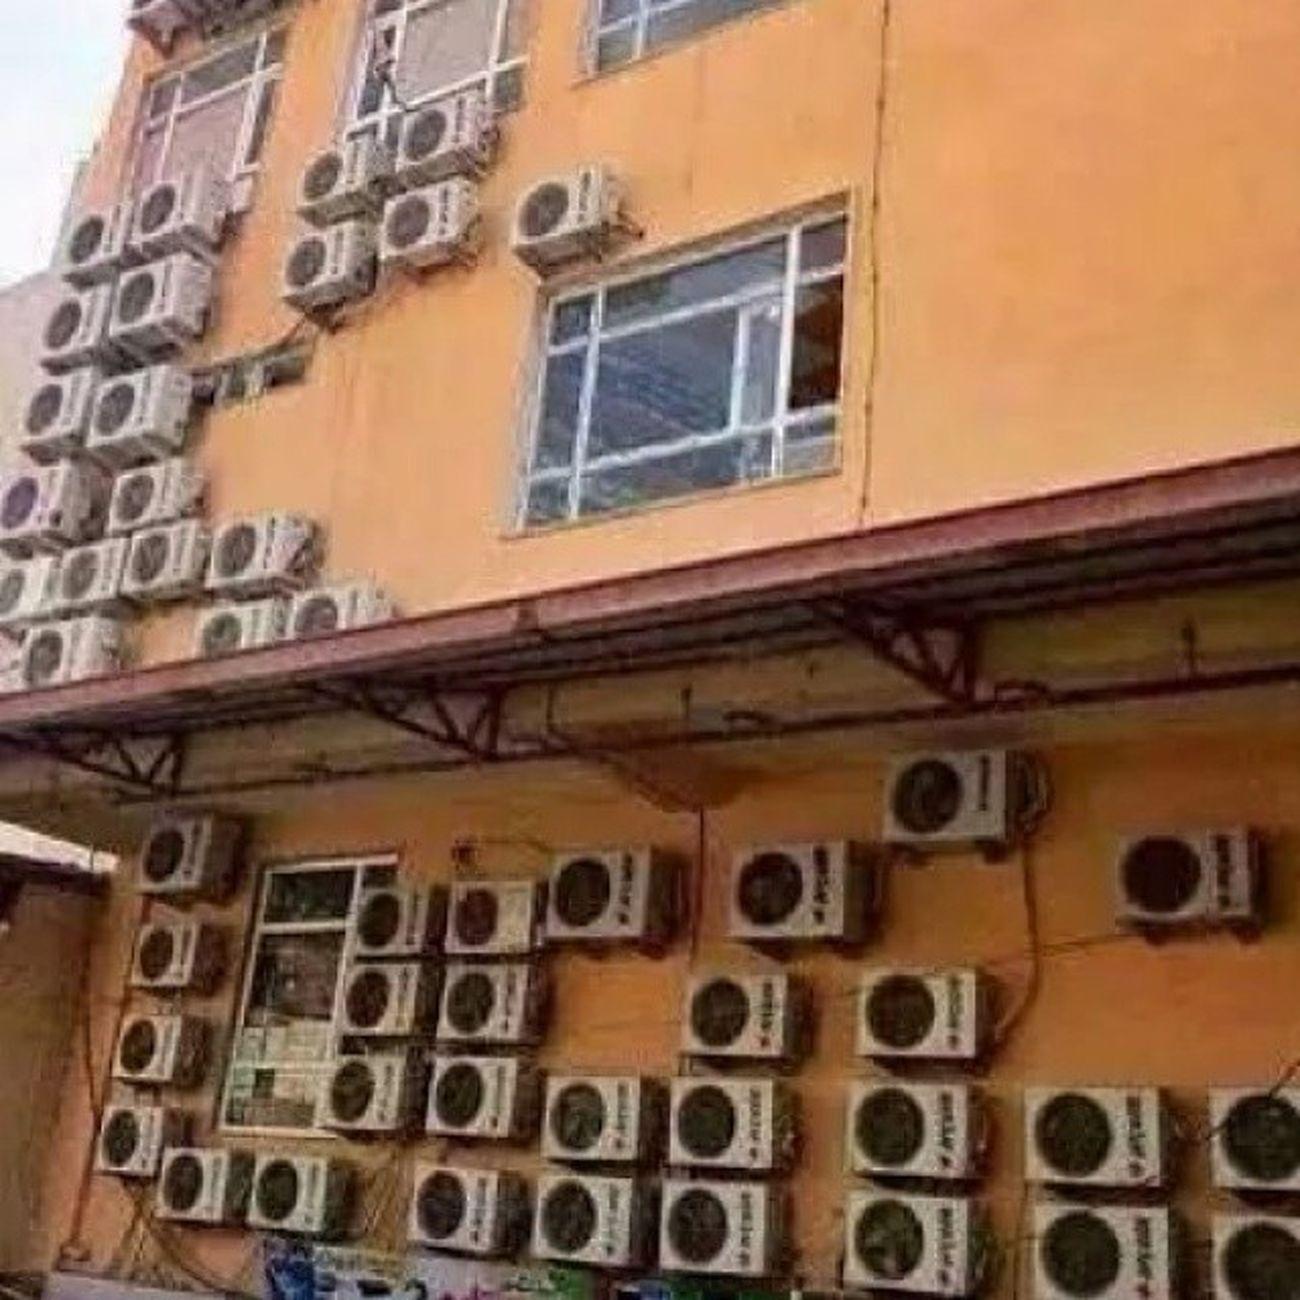 Sıcak Hot Summer Yaz klima aircon cool electric thereissomewallleft birazduvarkalmış